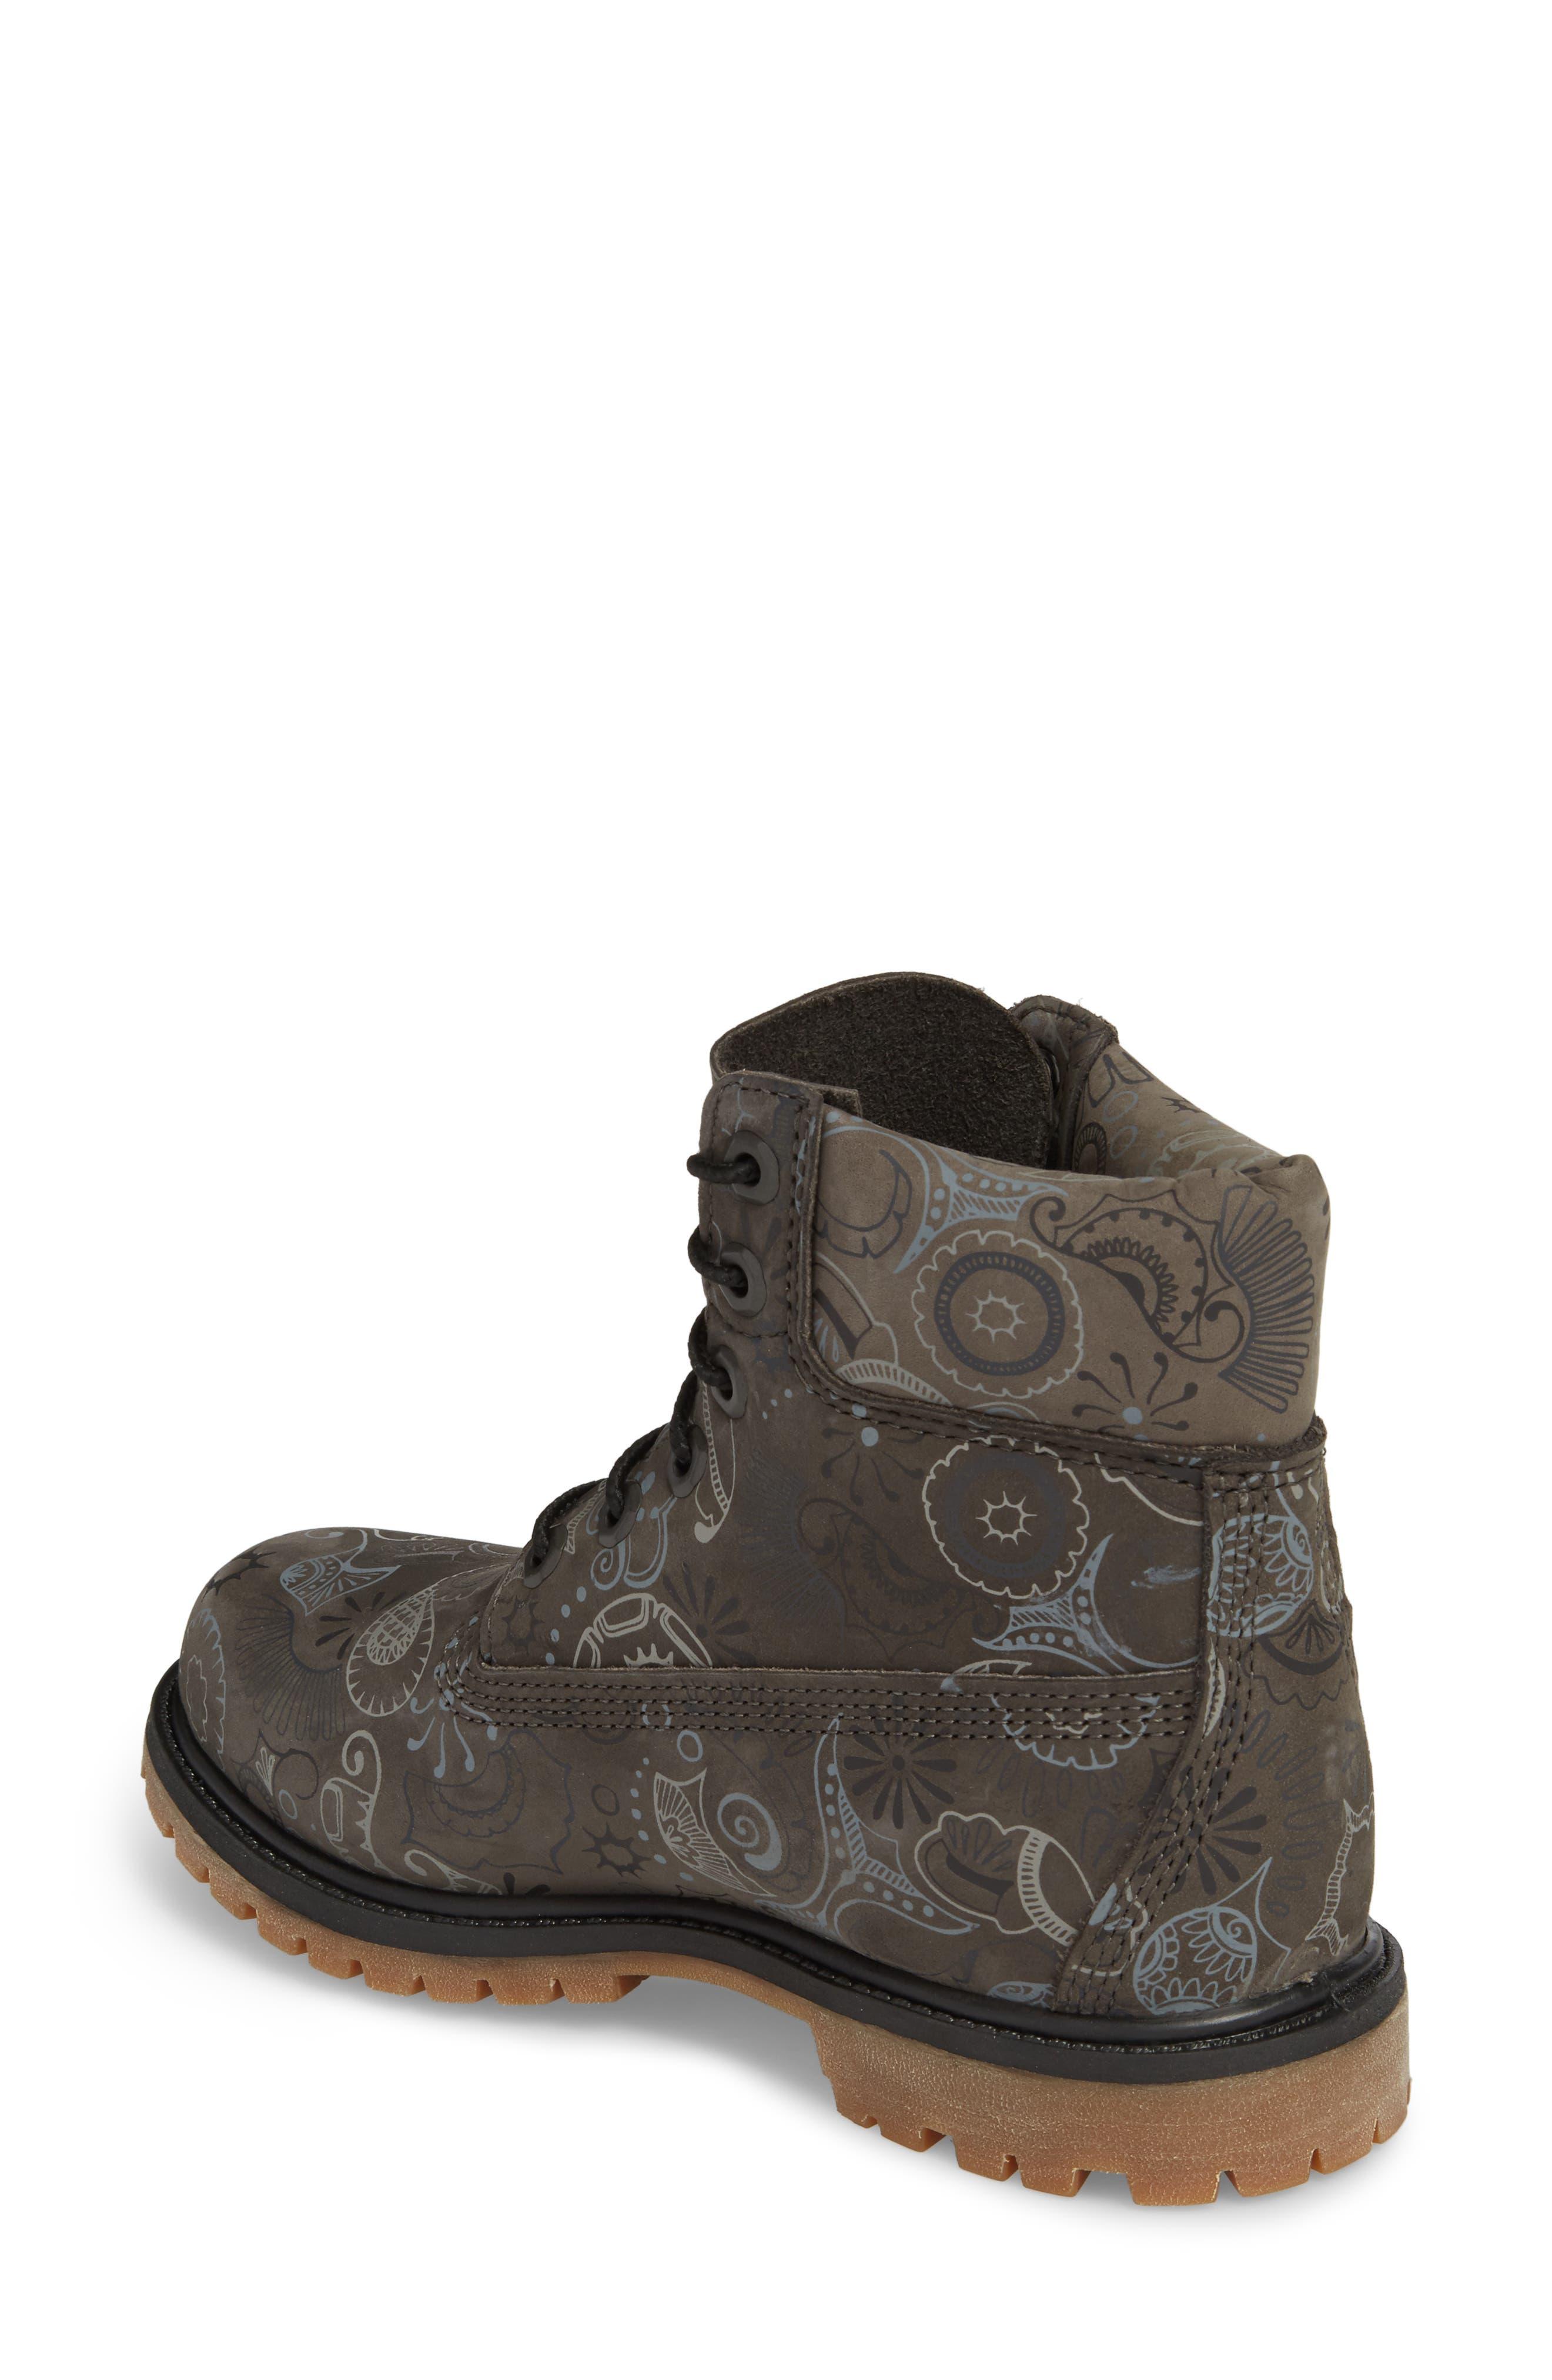 Henna Premium Boot,                             Alternate thumbnail 2, color,                             065